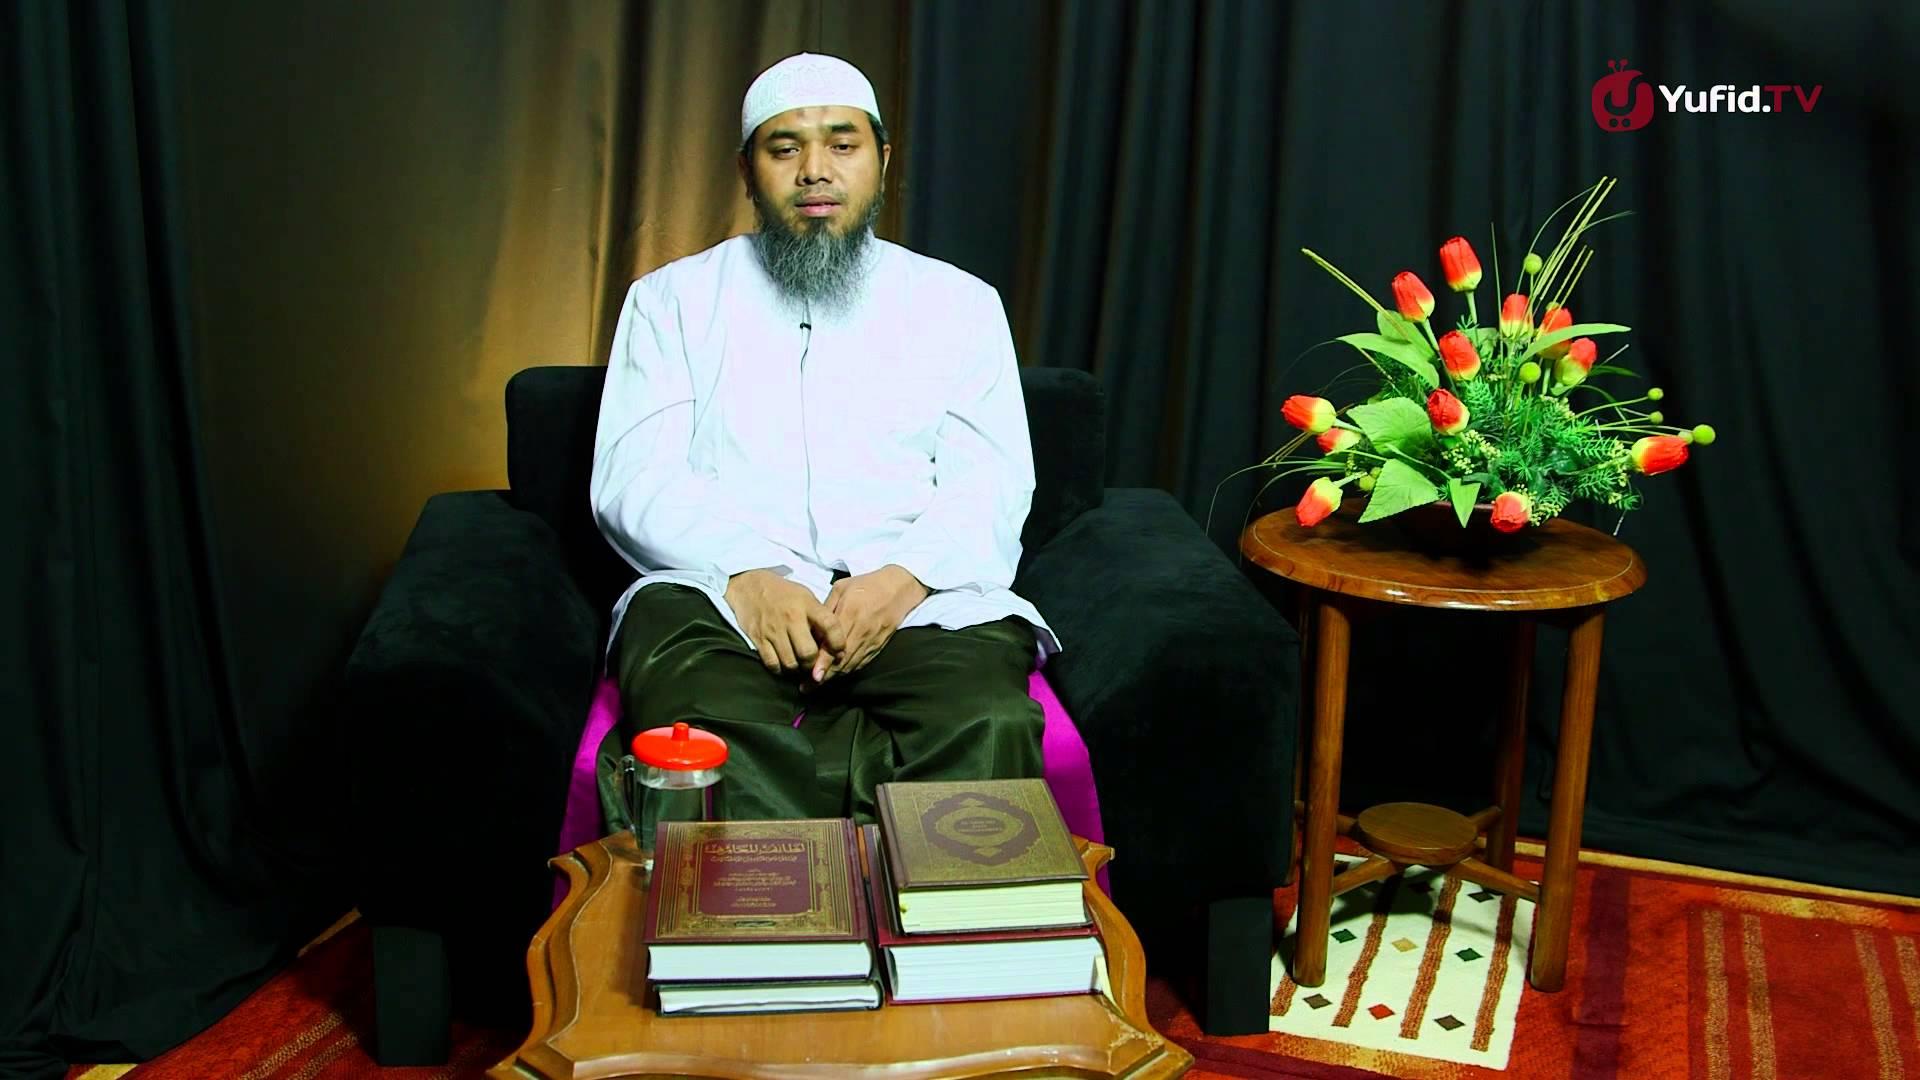 serial-aqidah-islam-06-aqidah-pendorong-utama-amal-kebaikan-ustadz ...